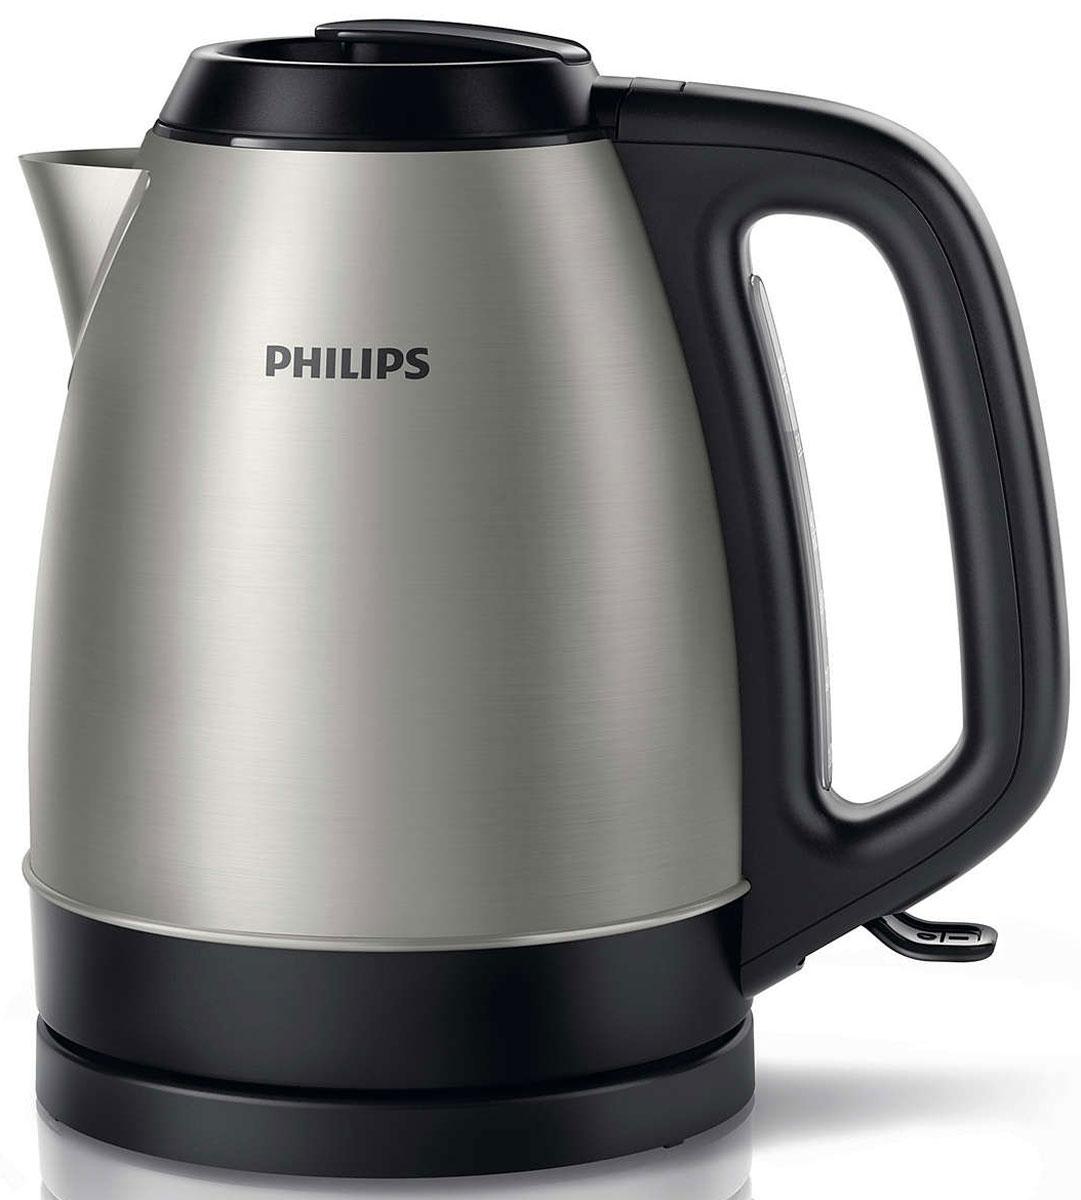 Philips HD9305/21 электрический чайник aucma aucma адк 1800d39 1 7l304 электрический чайник из нержавеющей стали двойной анти ошпаривают